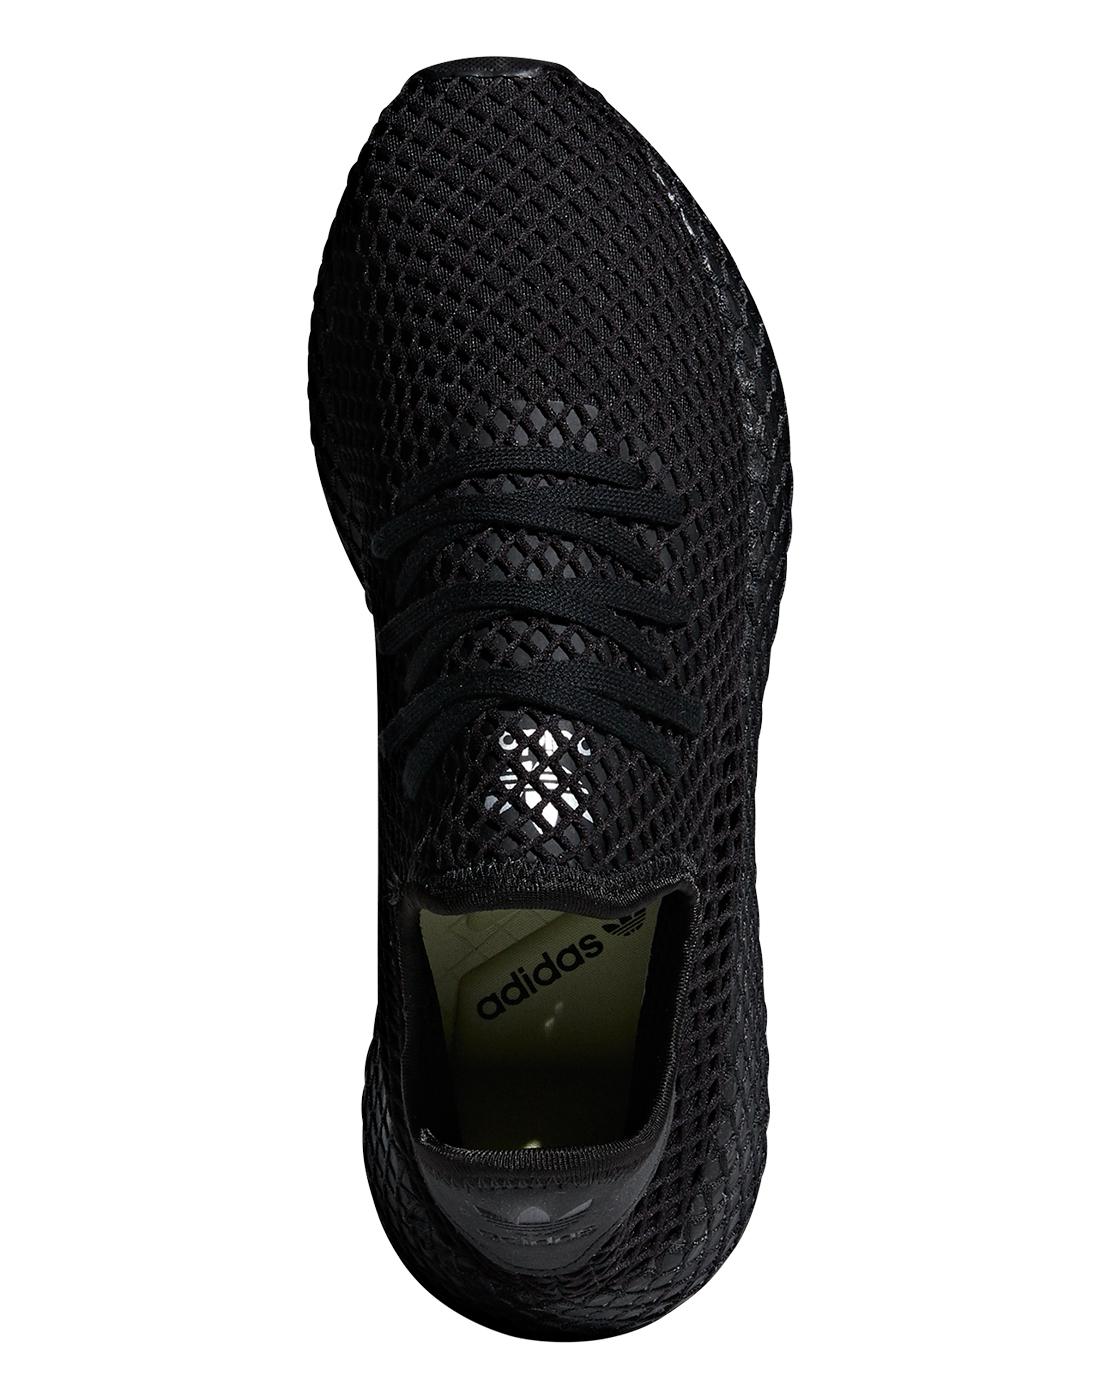 Men's adidas Originals Deerupt   Triple Black   Life Style